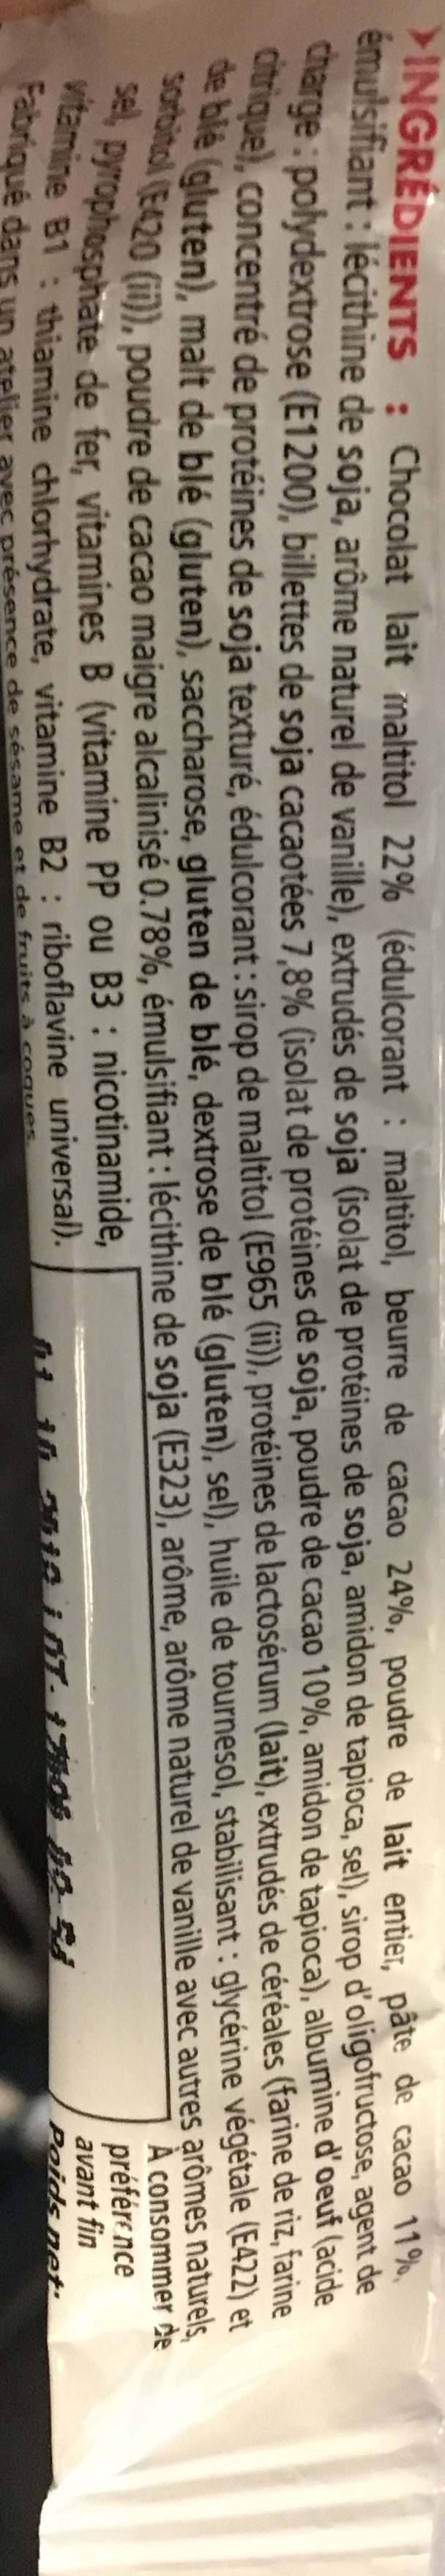 Eafit Proticereal - Barre Minceur Chocolat - Ingrédients - fr